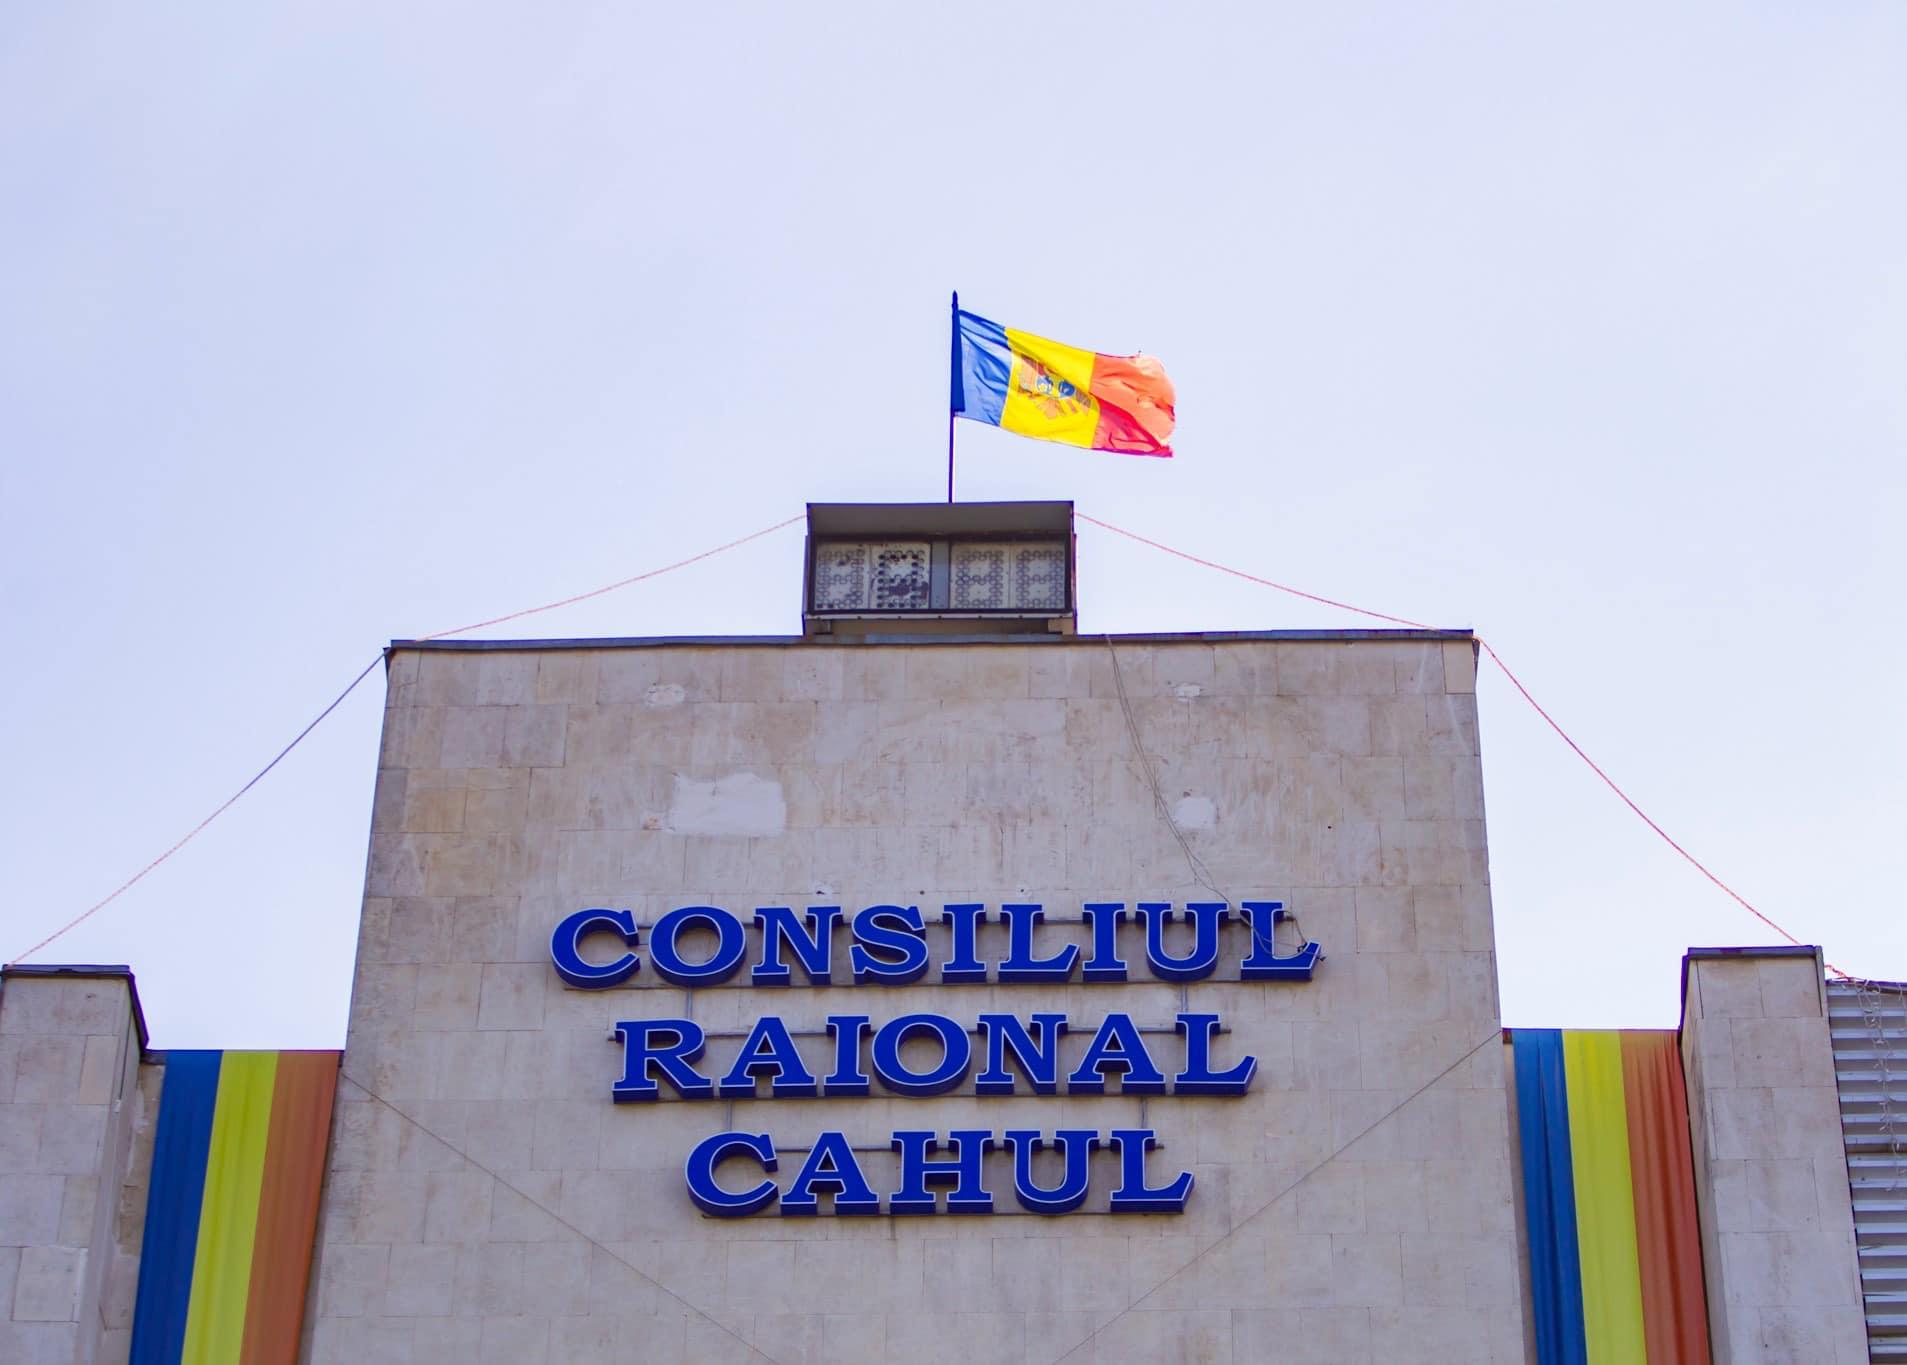 consiliul raional cahul